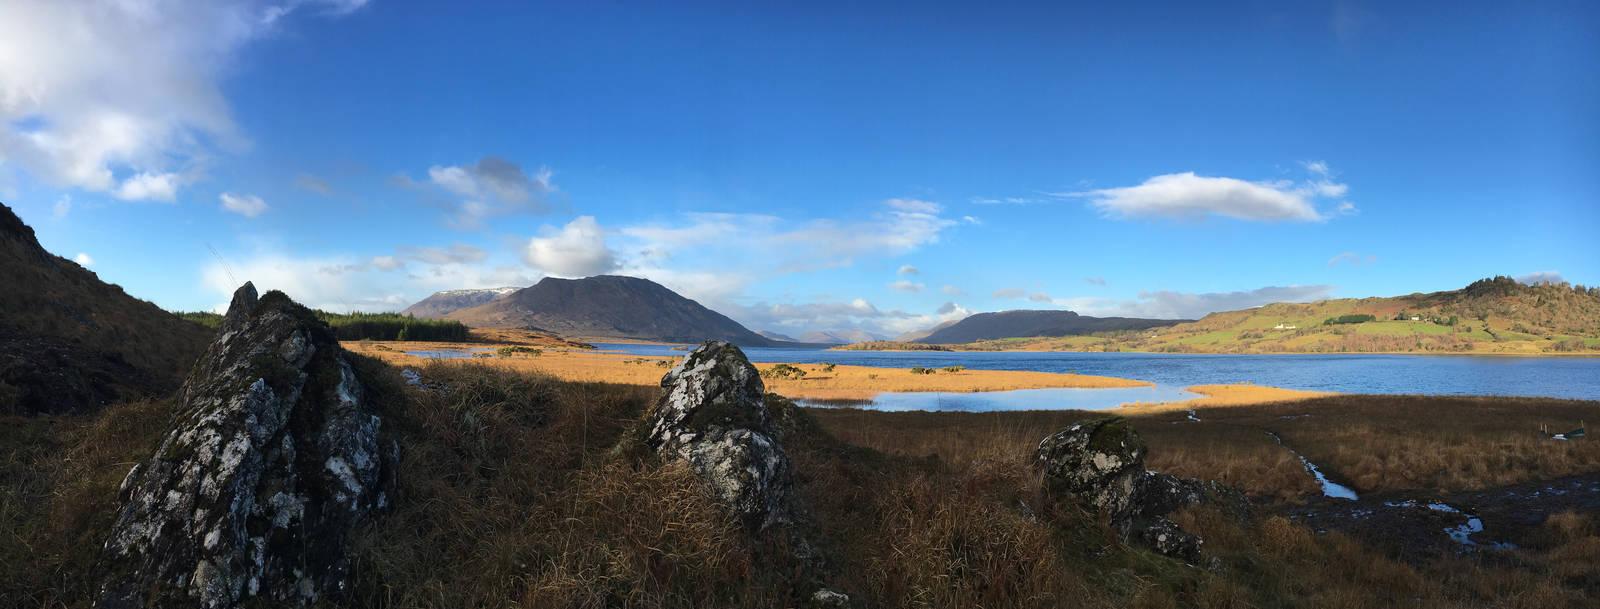 Upper Lough Corrib looking toward the Maam Valley